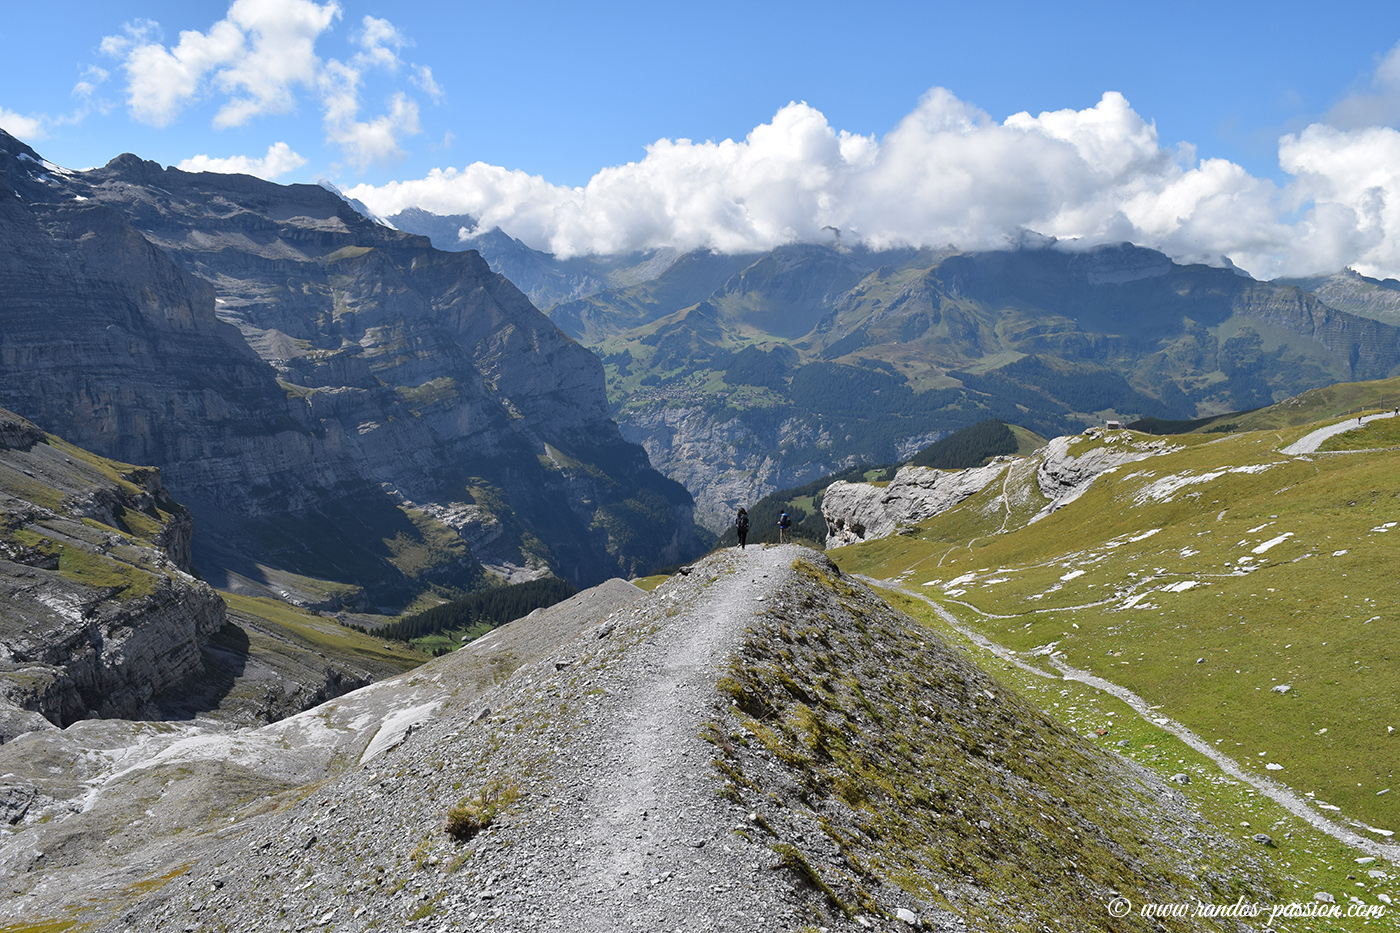 La moraine du glacier Eigergletscher